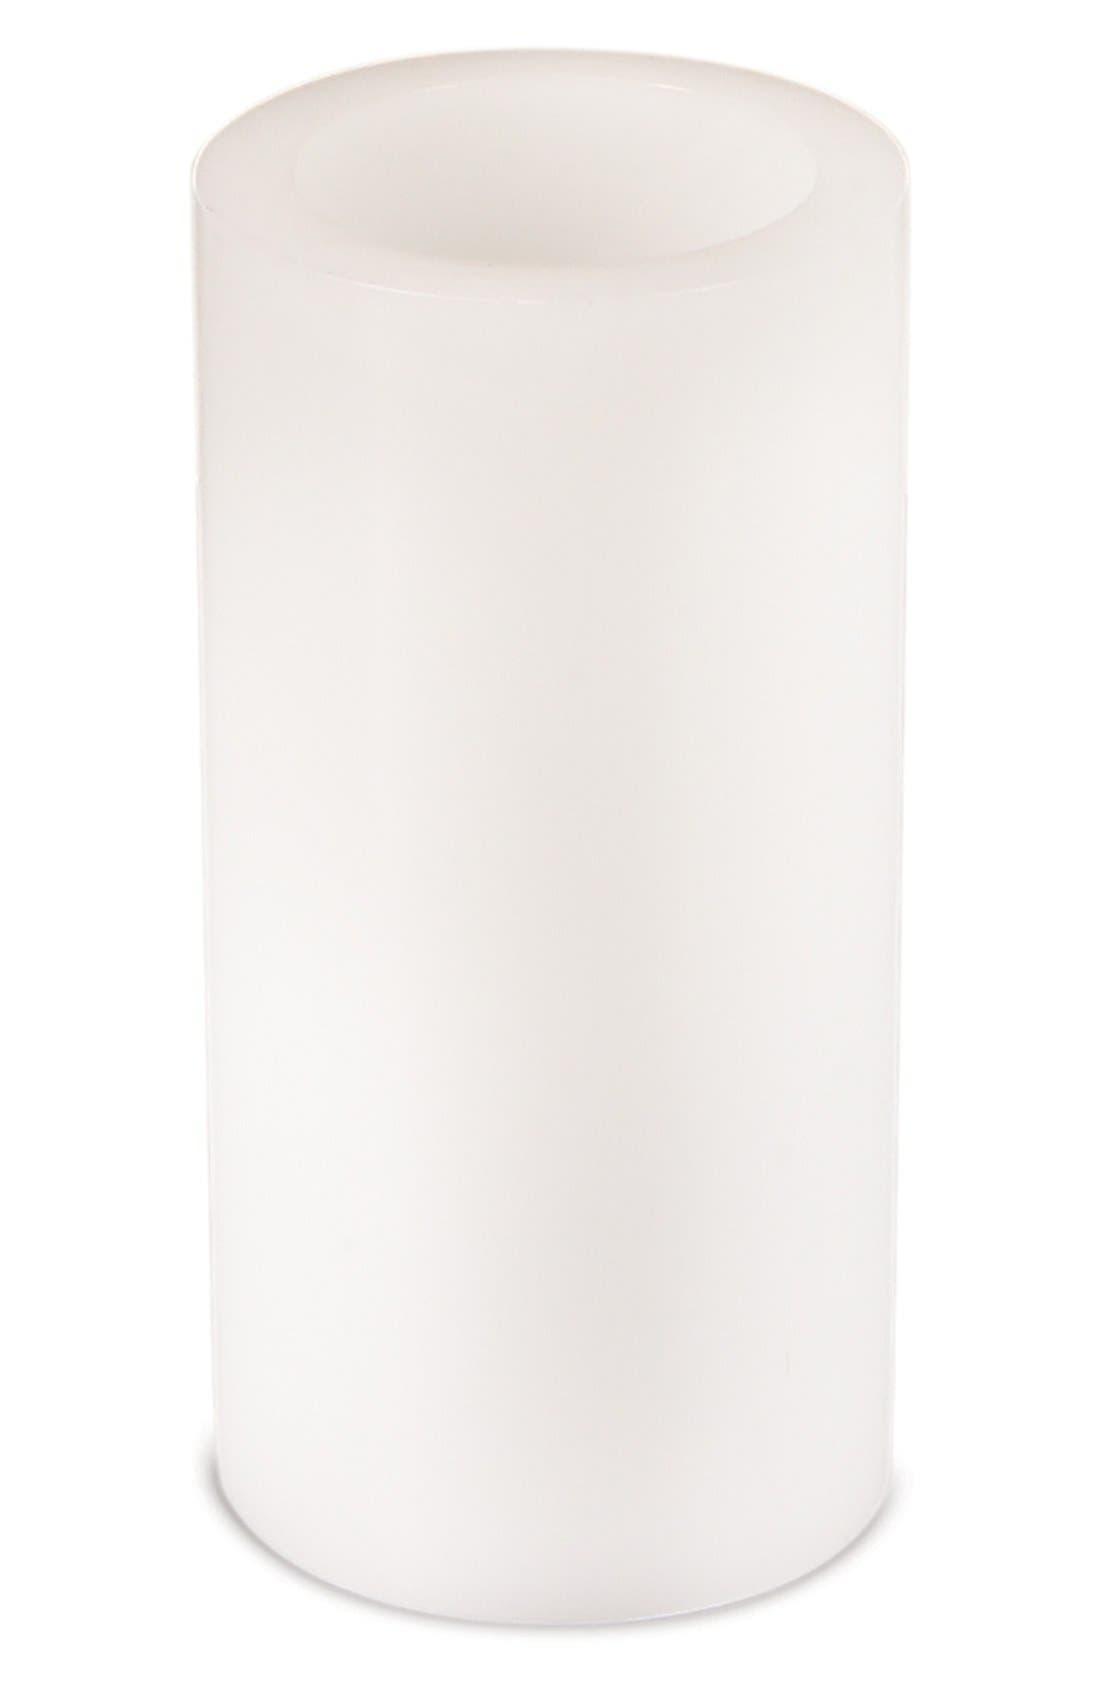 MELROSE GIFTS White Pillar LED Candle